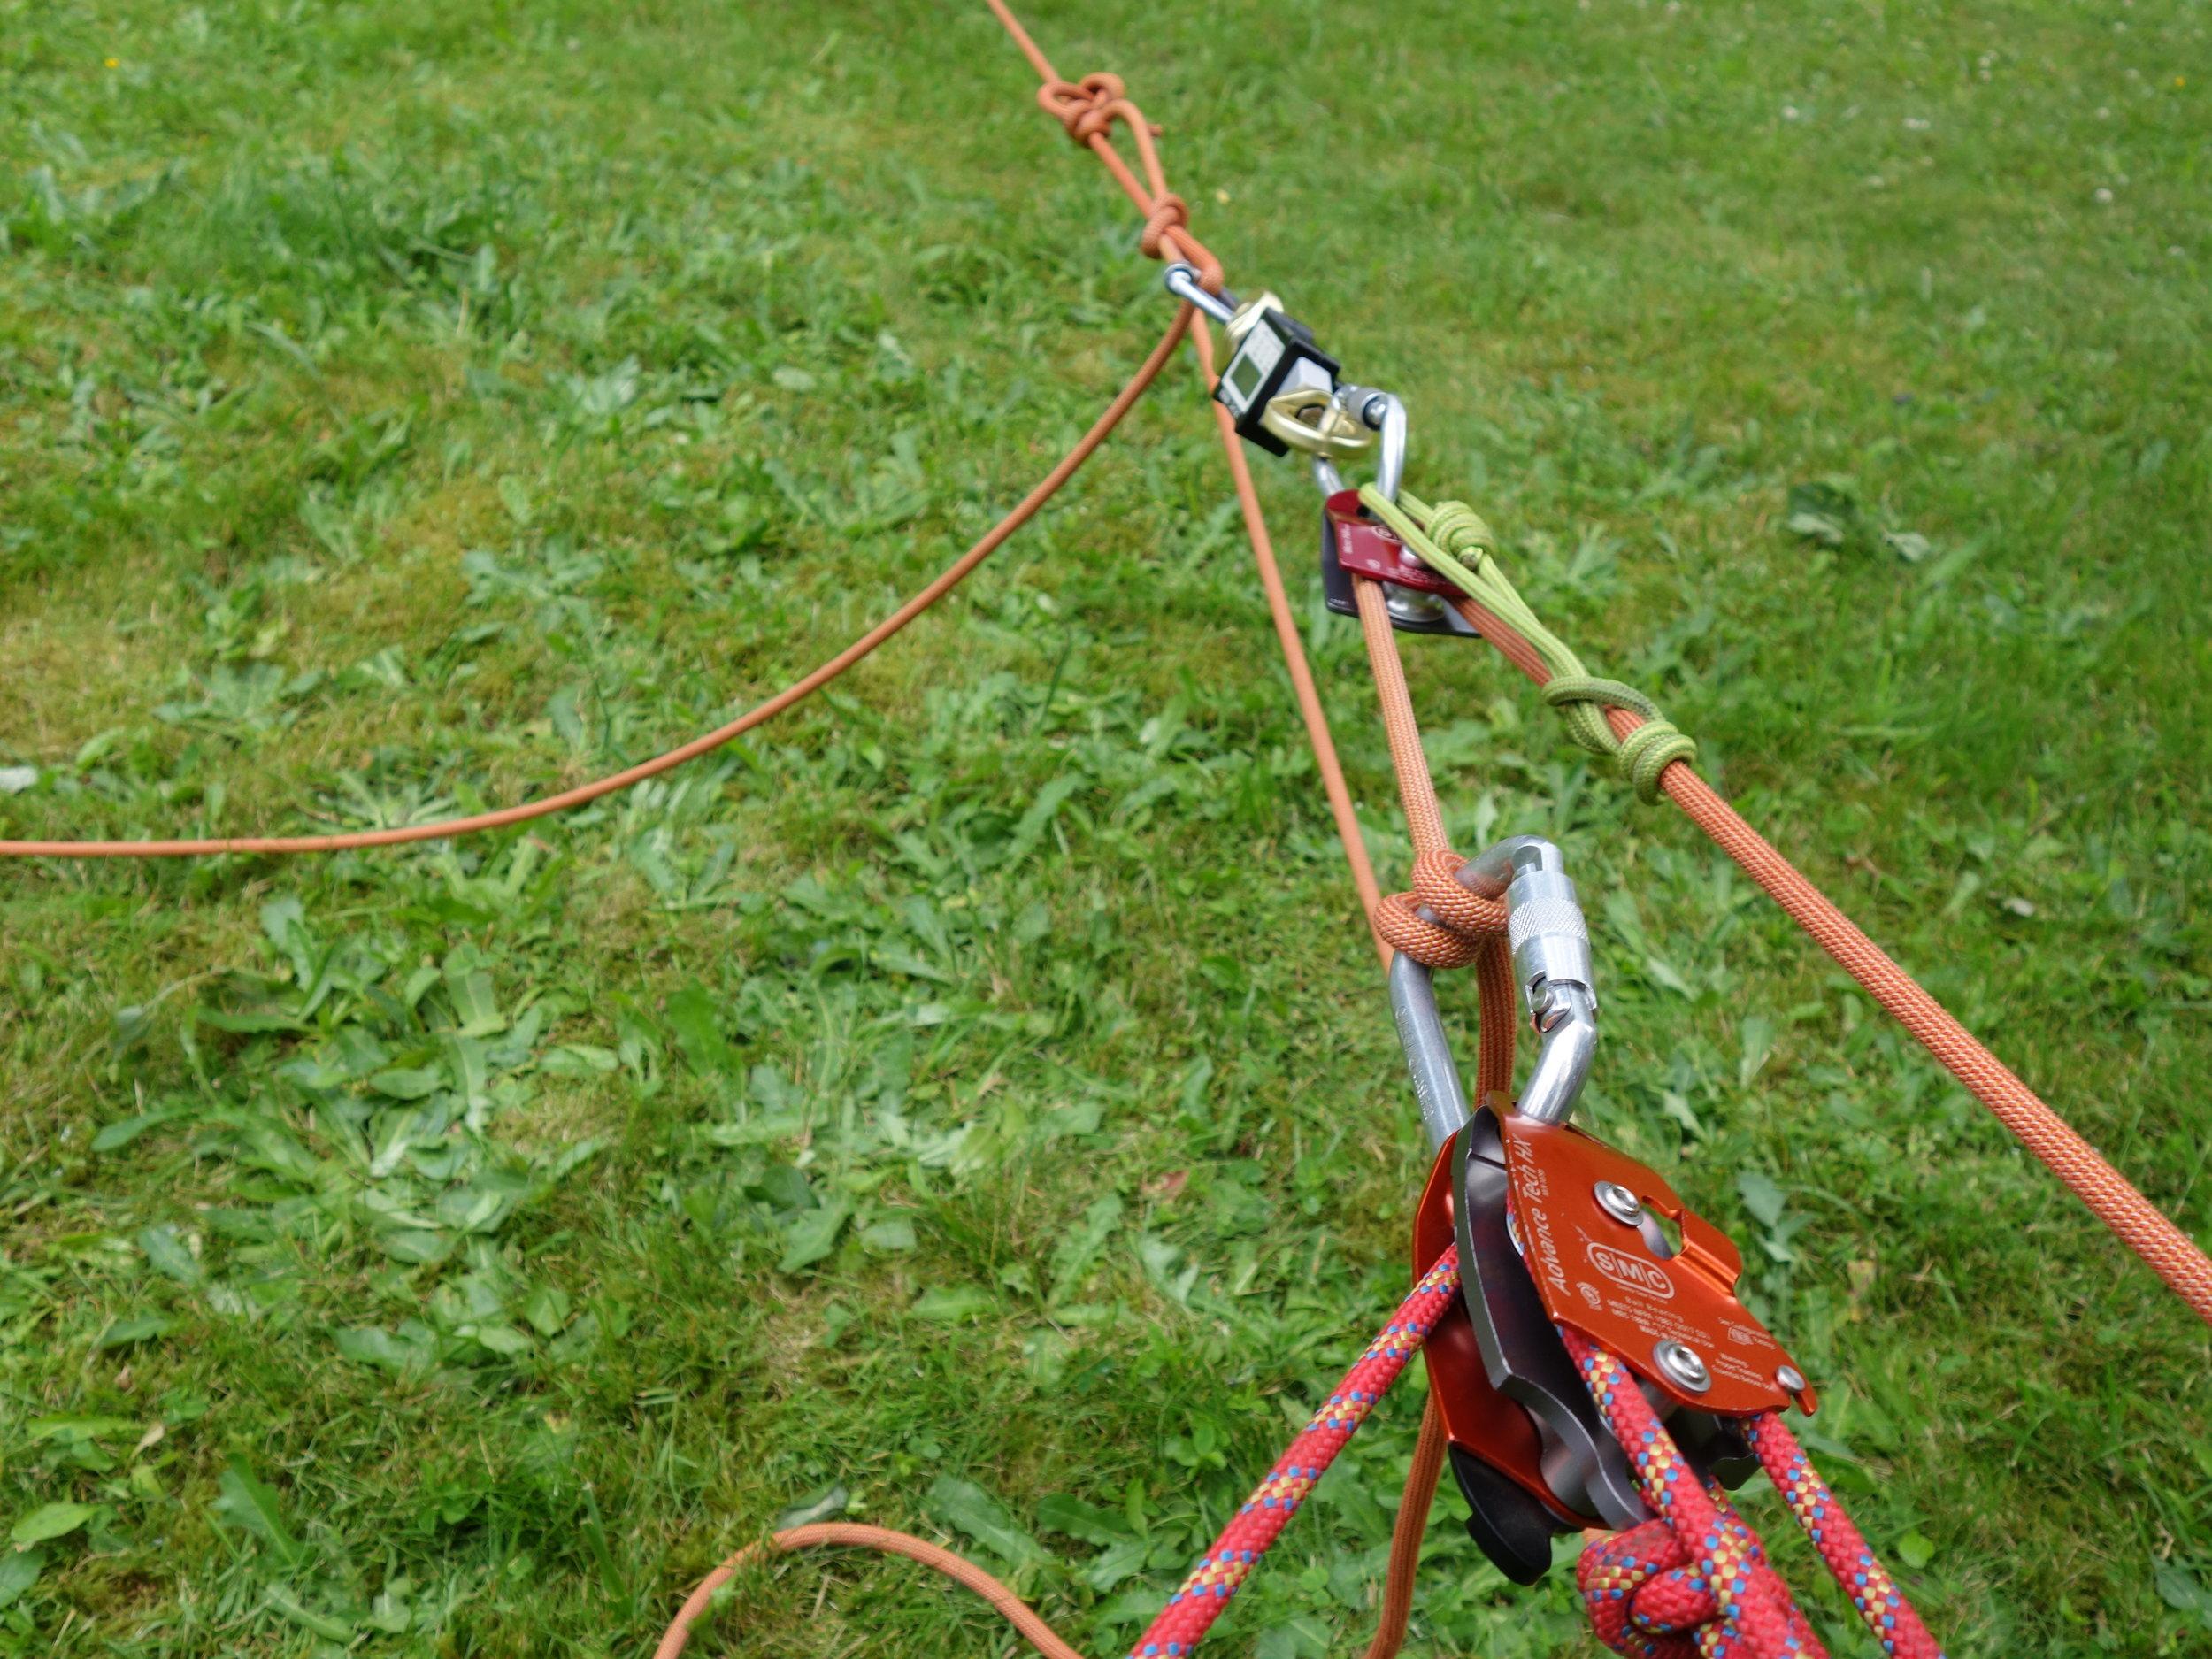 The testing set-up. 10:1 mechanical advantage rig.